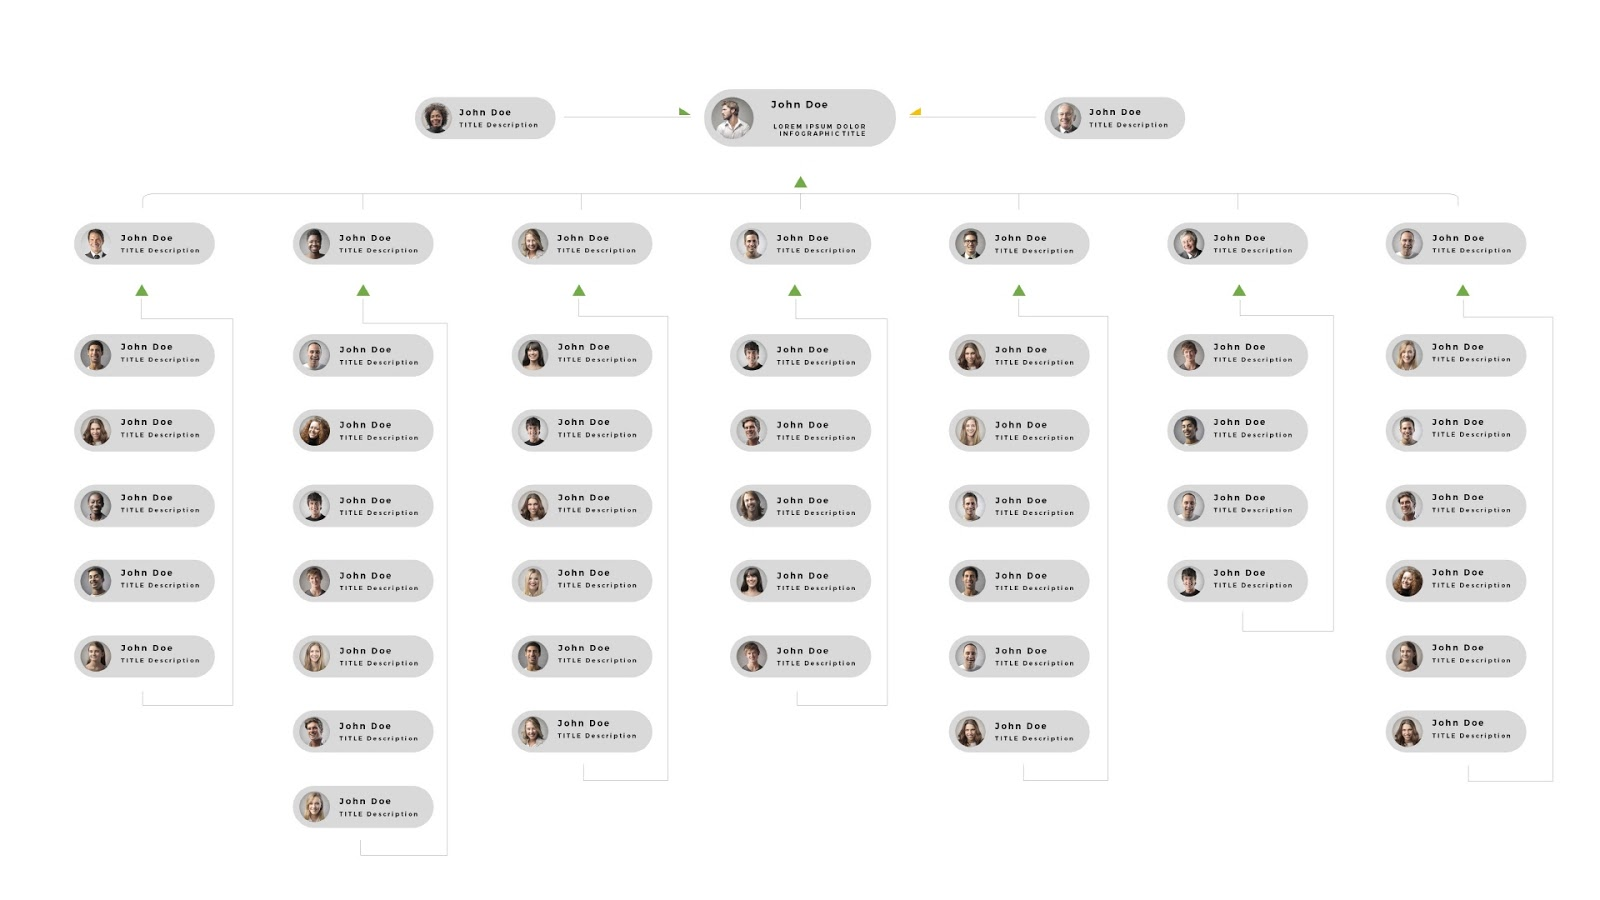 Free organization charts with 4k slide resolution for powerpoint free organization charts free powerpoint template with 4k slide resolution type a toneelgroepblik Images